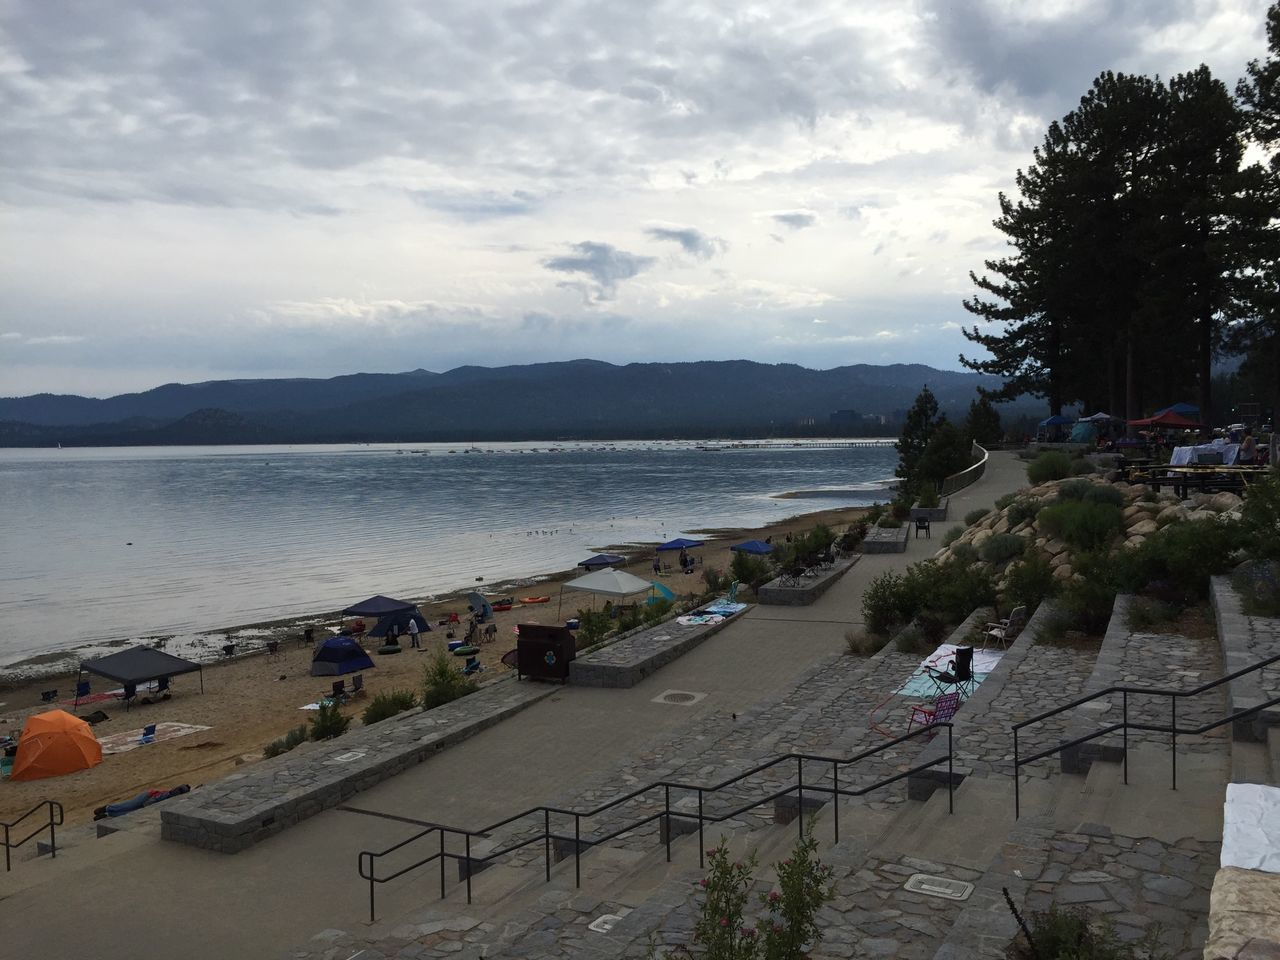 4th Of July 2015 🇺🇸 Lake View Lakeshore Lakefront Holiday 4th Of July Fourth Of July Fourthofjuly2015